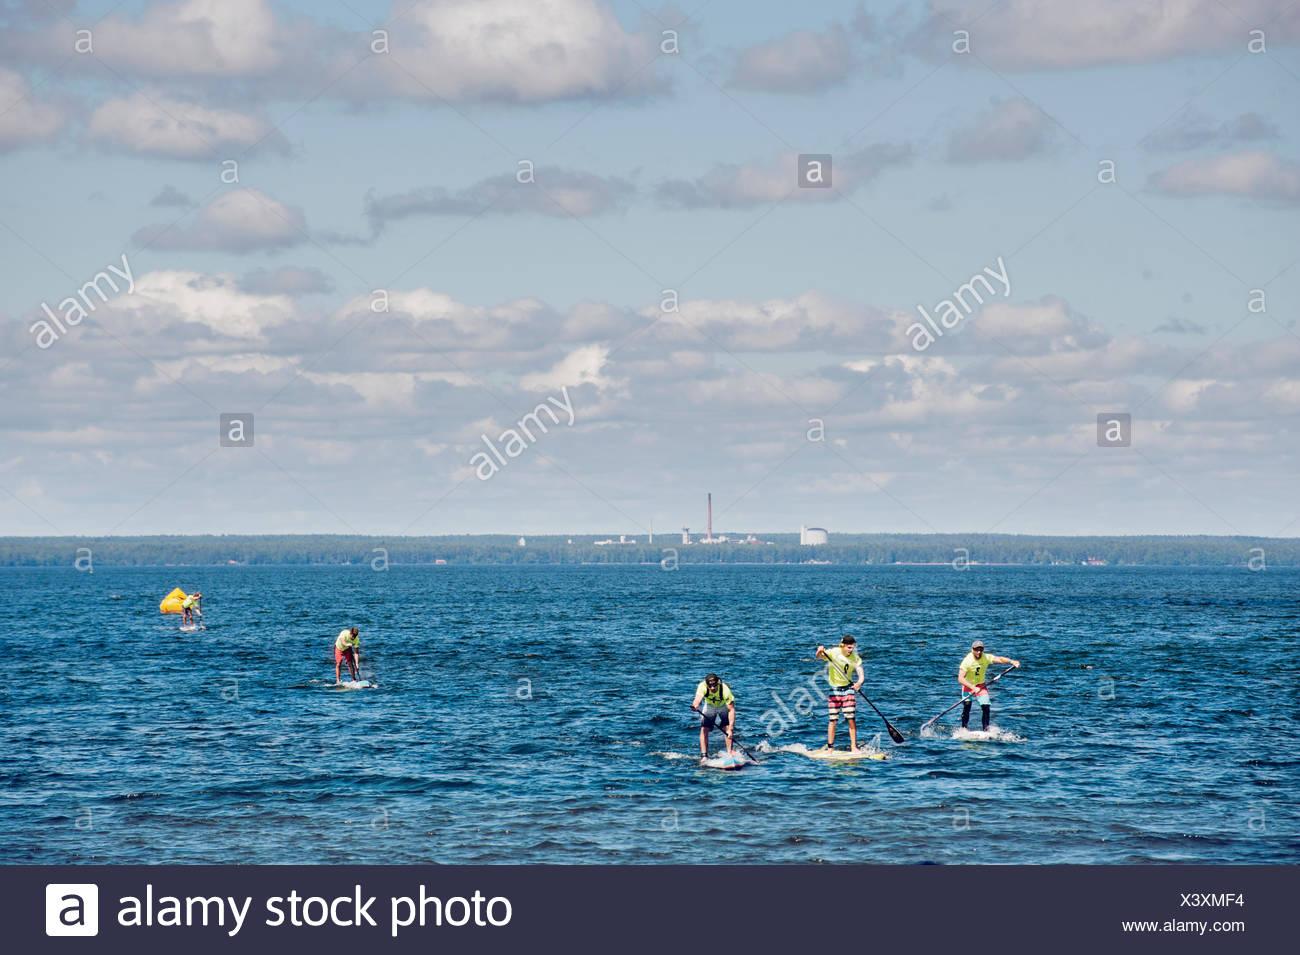 Finland, Varsinais-Suomi, Eura, Lake Pyhajarvi, Young men paddleboarding on lake - Stock Image